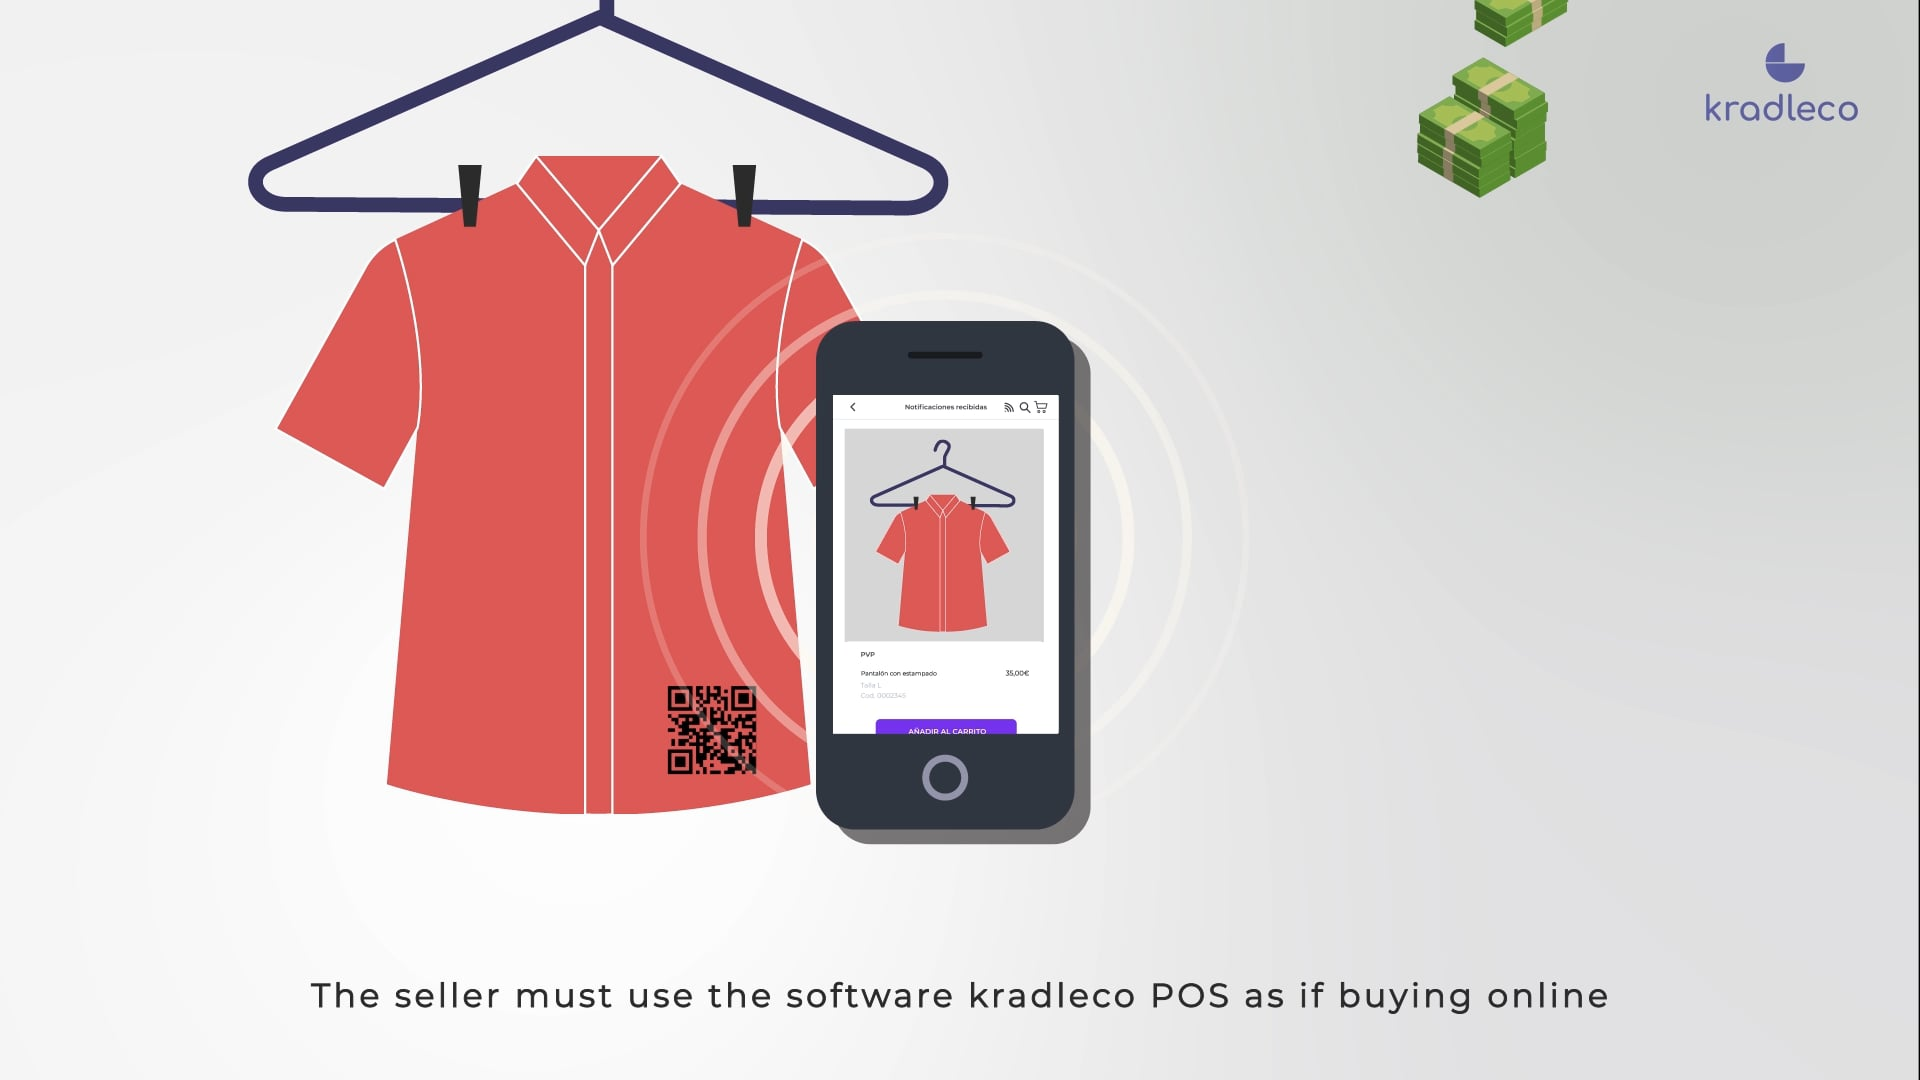 Cómo funciona kradleco, la start Up del Retail del futuro